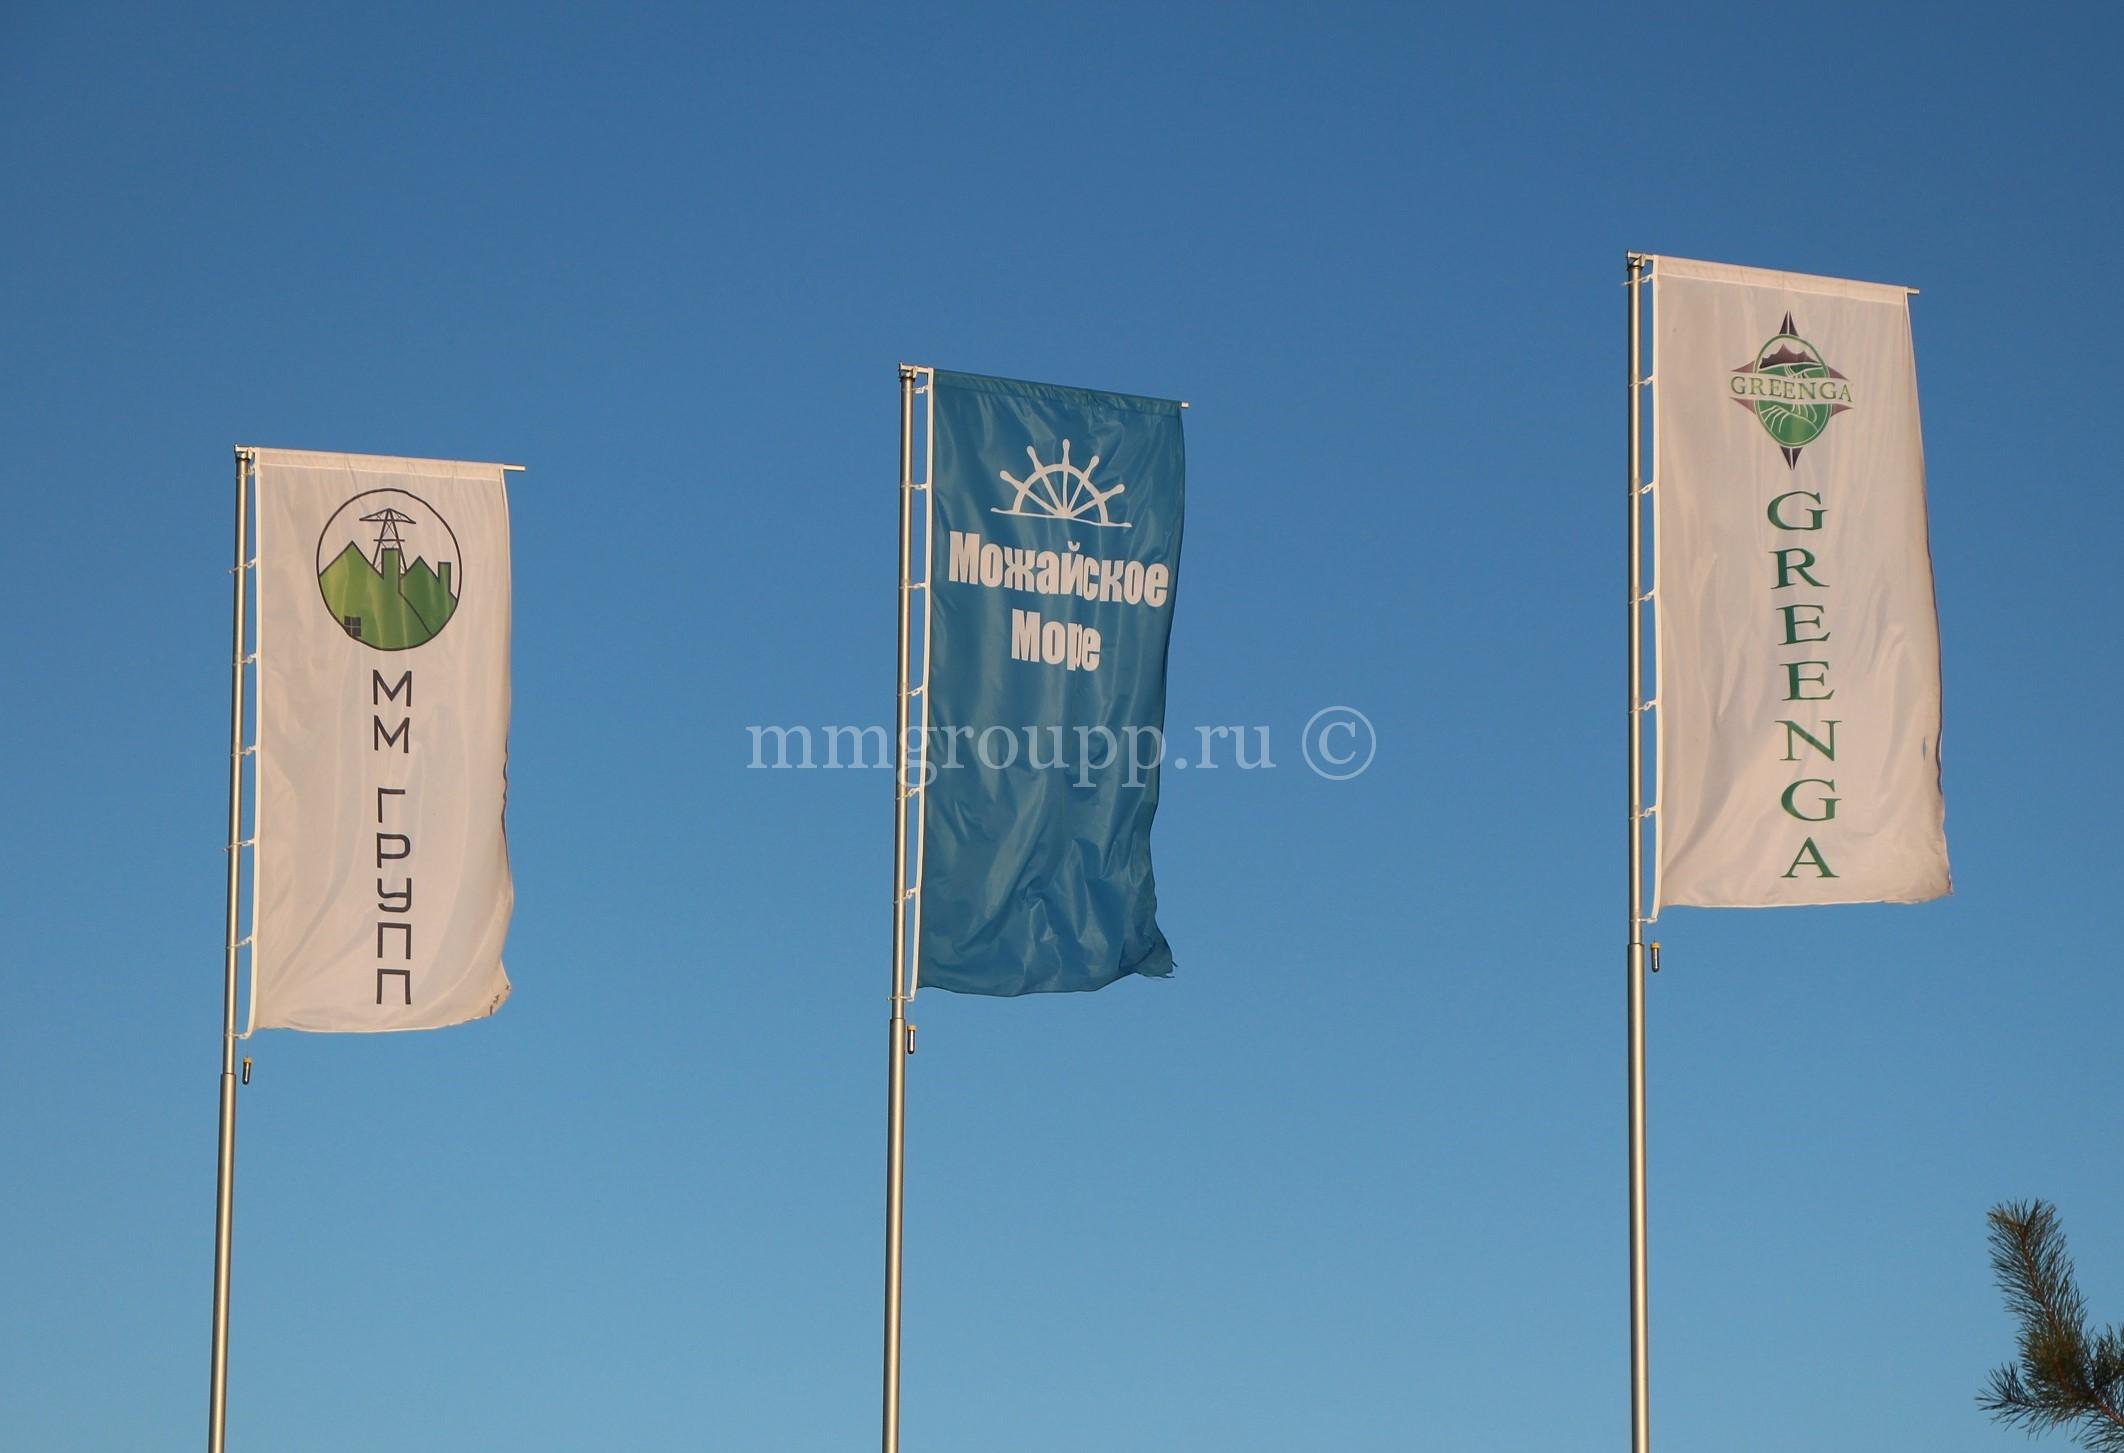 Флаги Можайское море